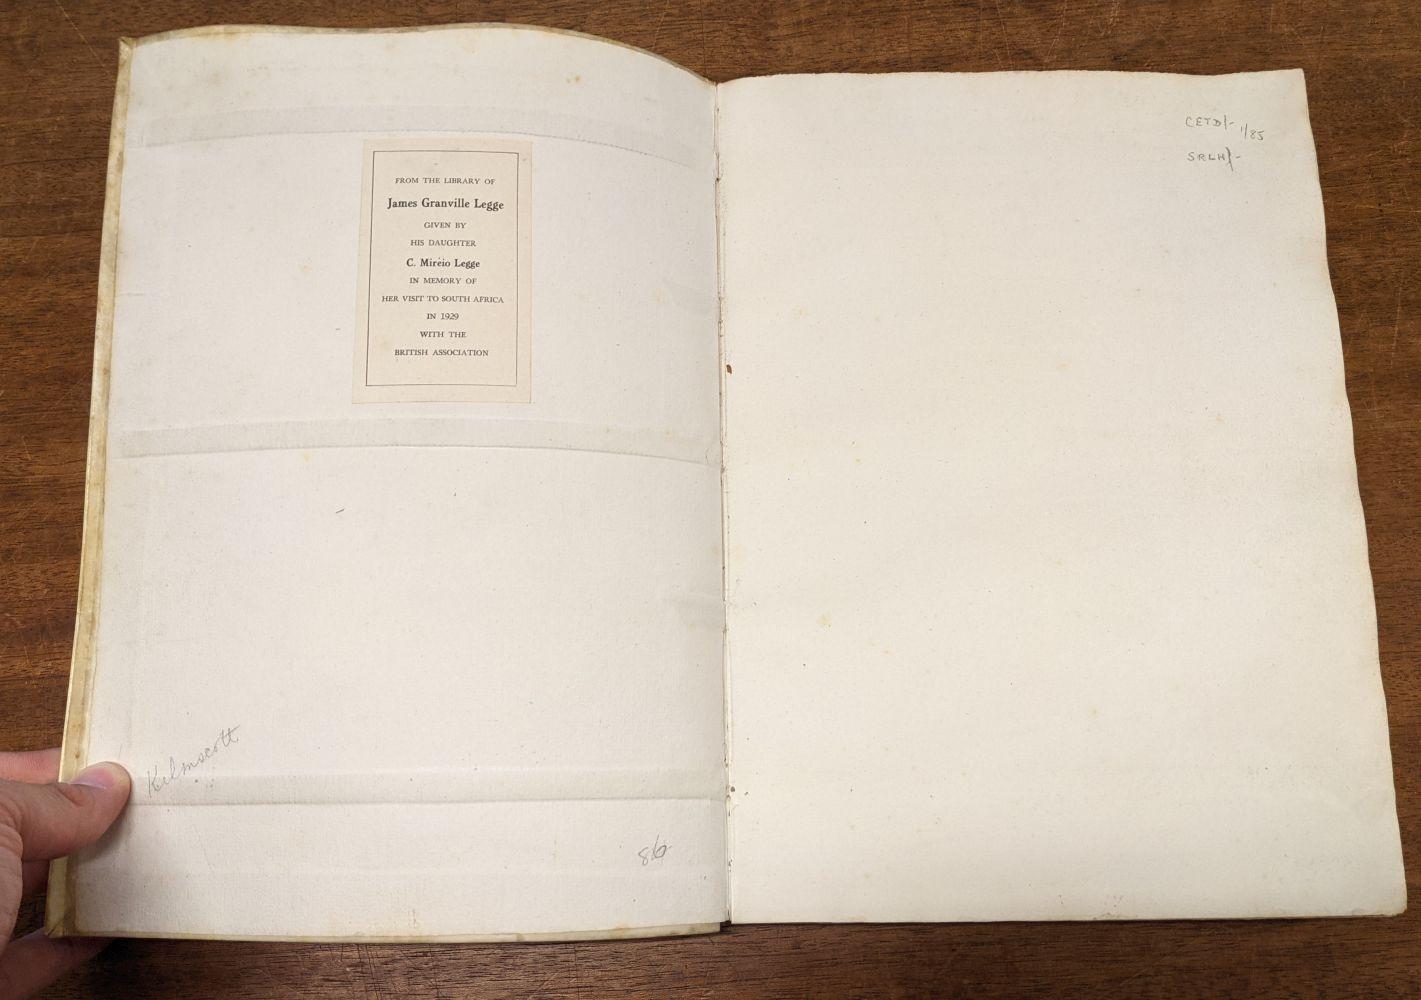 Kelmscott Press. The Story of the Glittering Plain, 1894 - Image 5 of 10